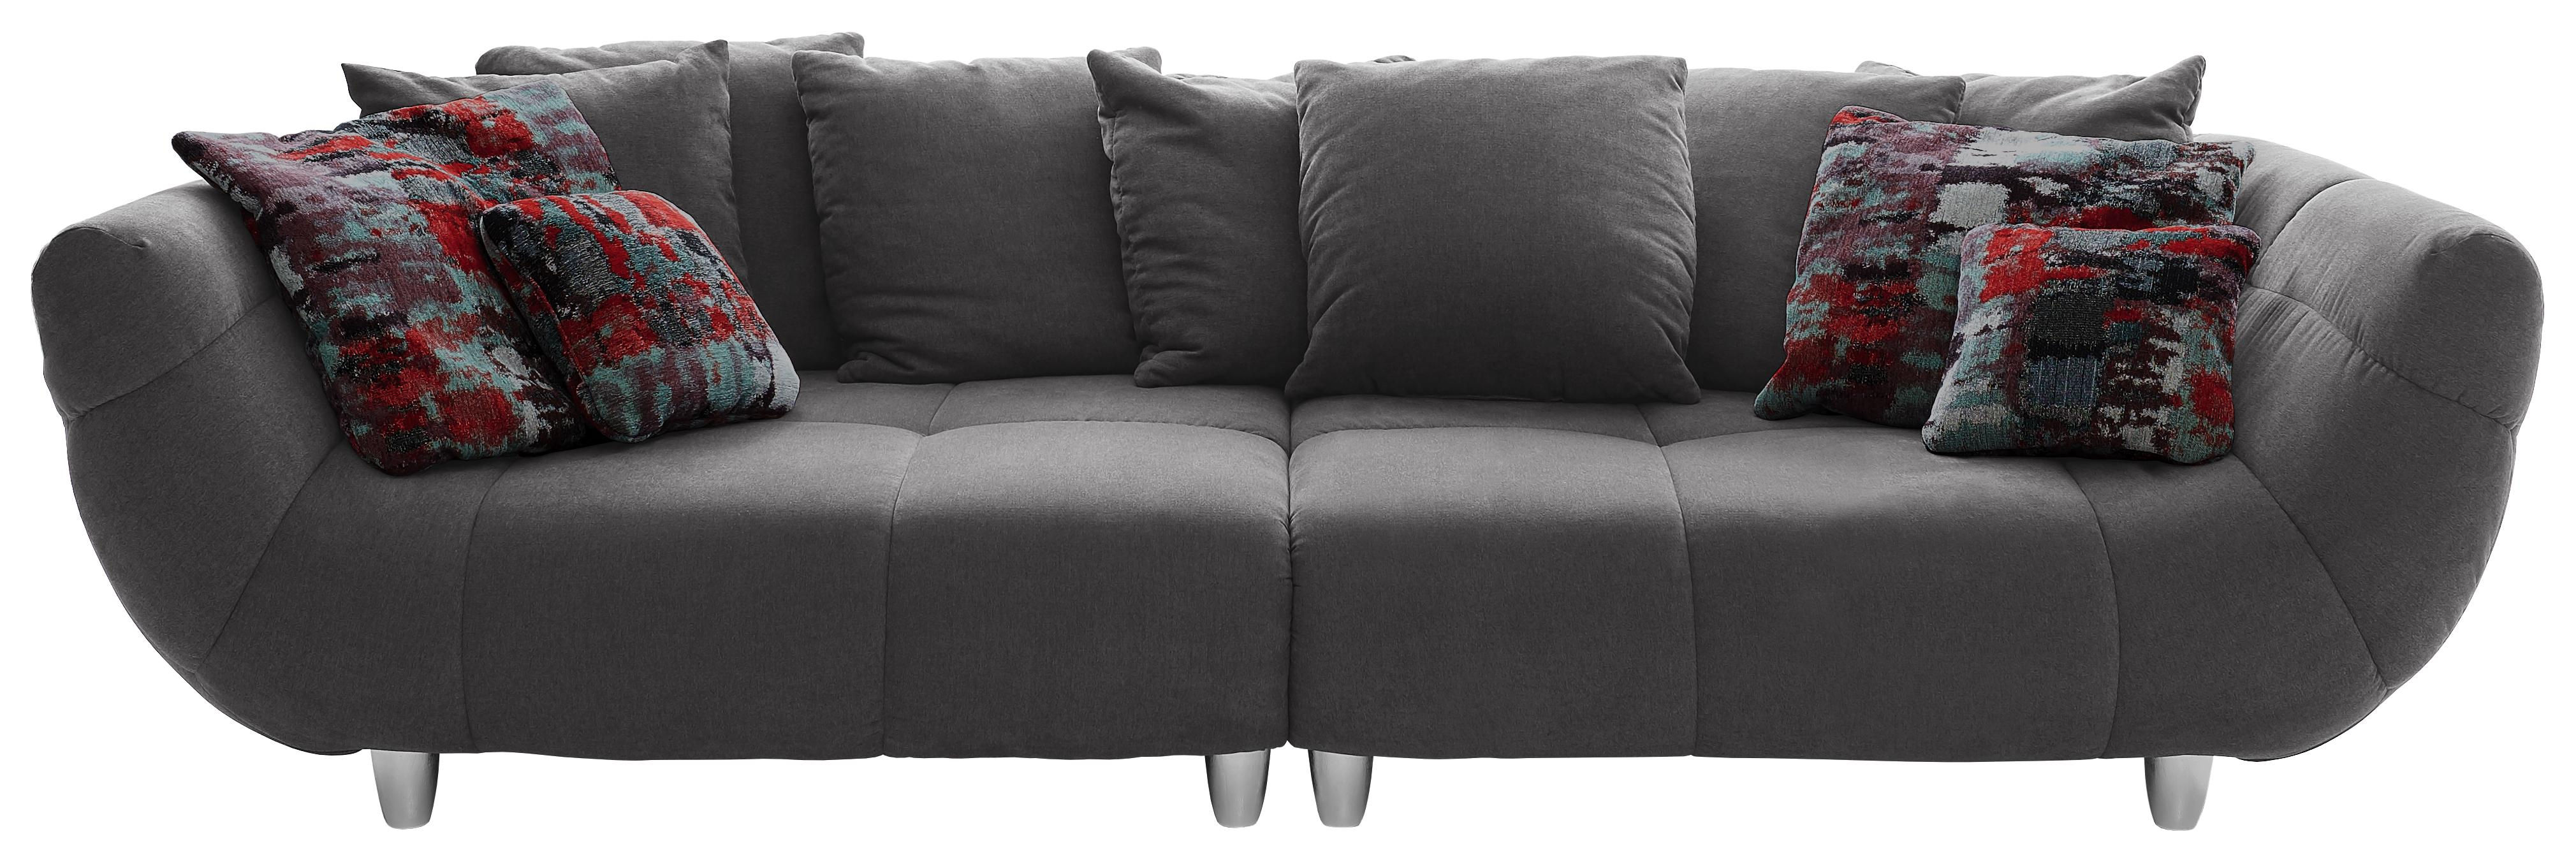 MEGA POHOVKA, šedá, textilie, - šedá/bílá, Design, textilie/umělá hmota (300/87/133cm) - Hom`in